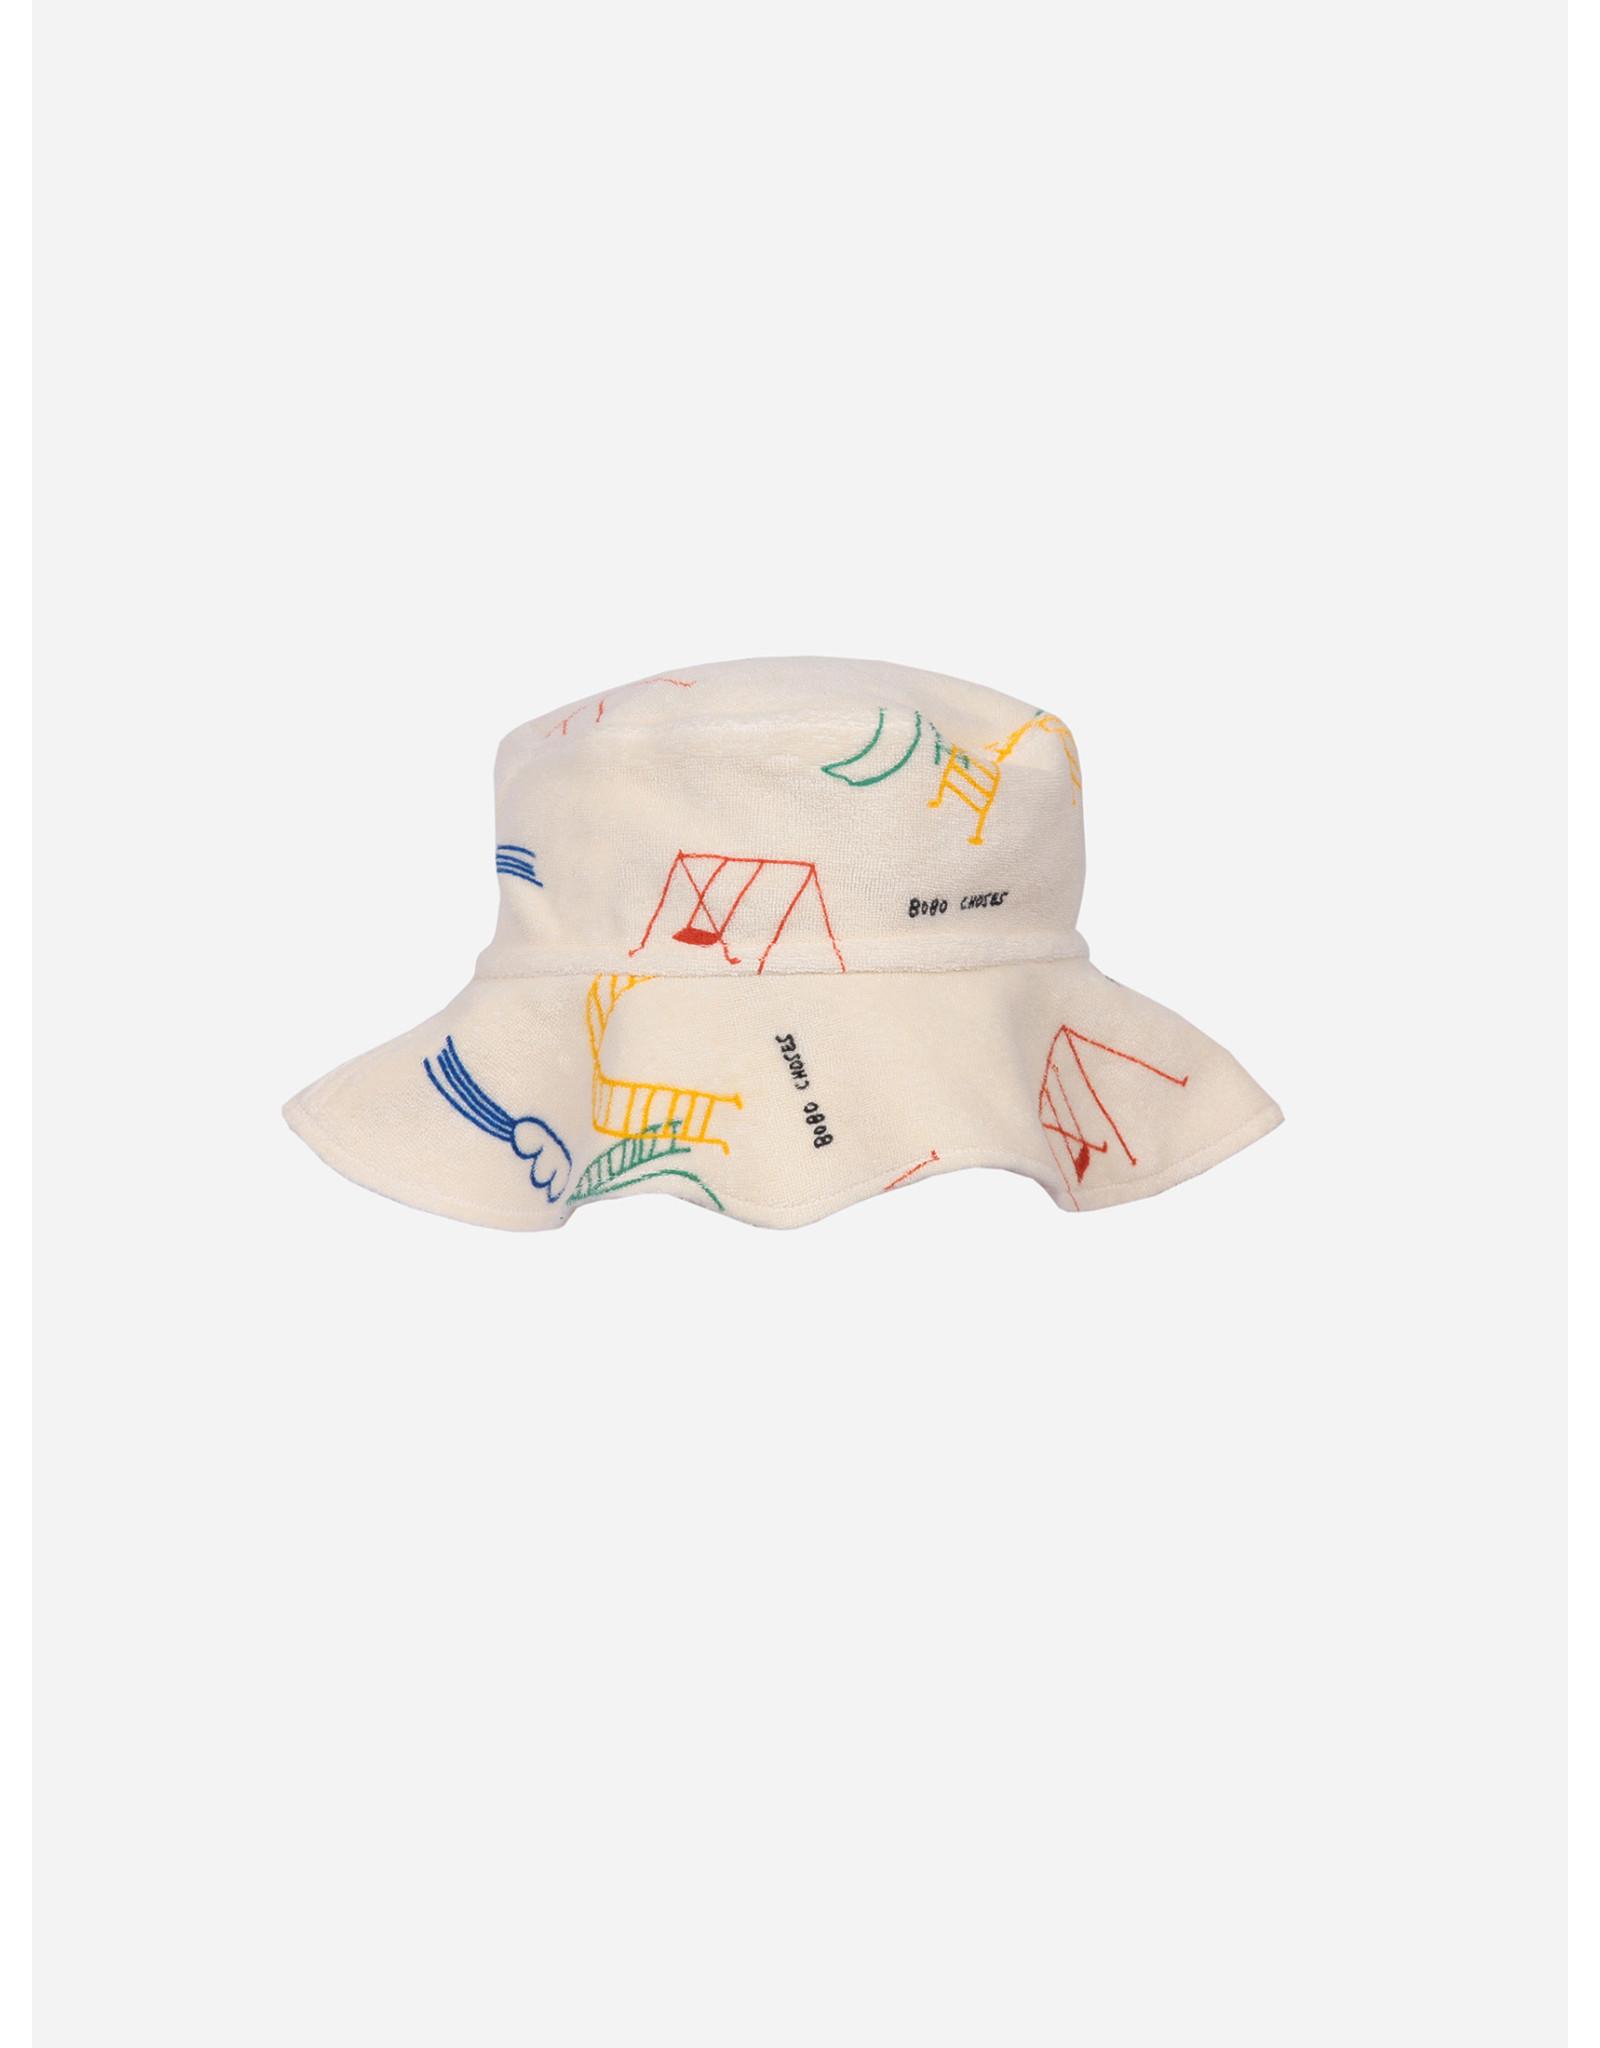 Bobo Choses Bobo Choses Playground All Over Hat